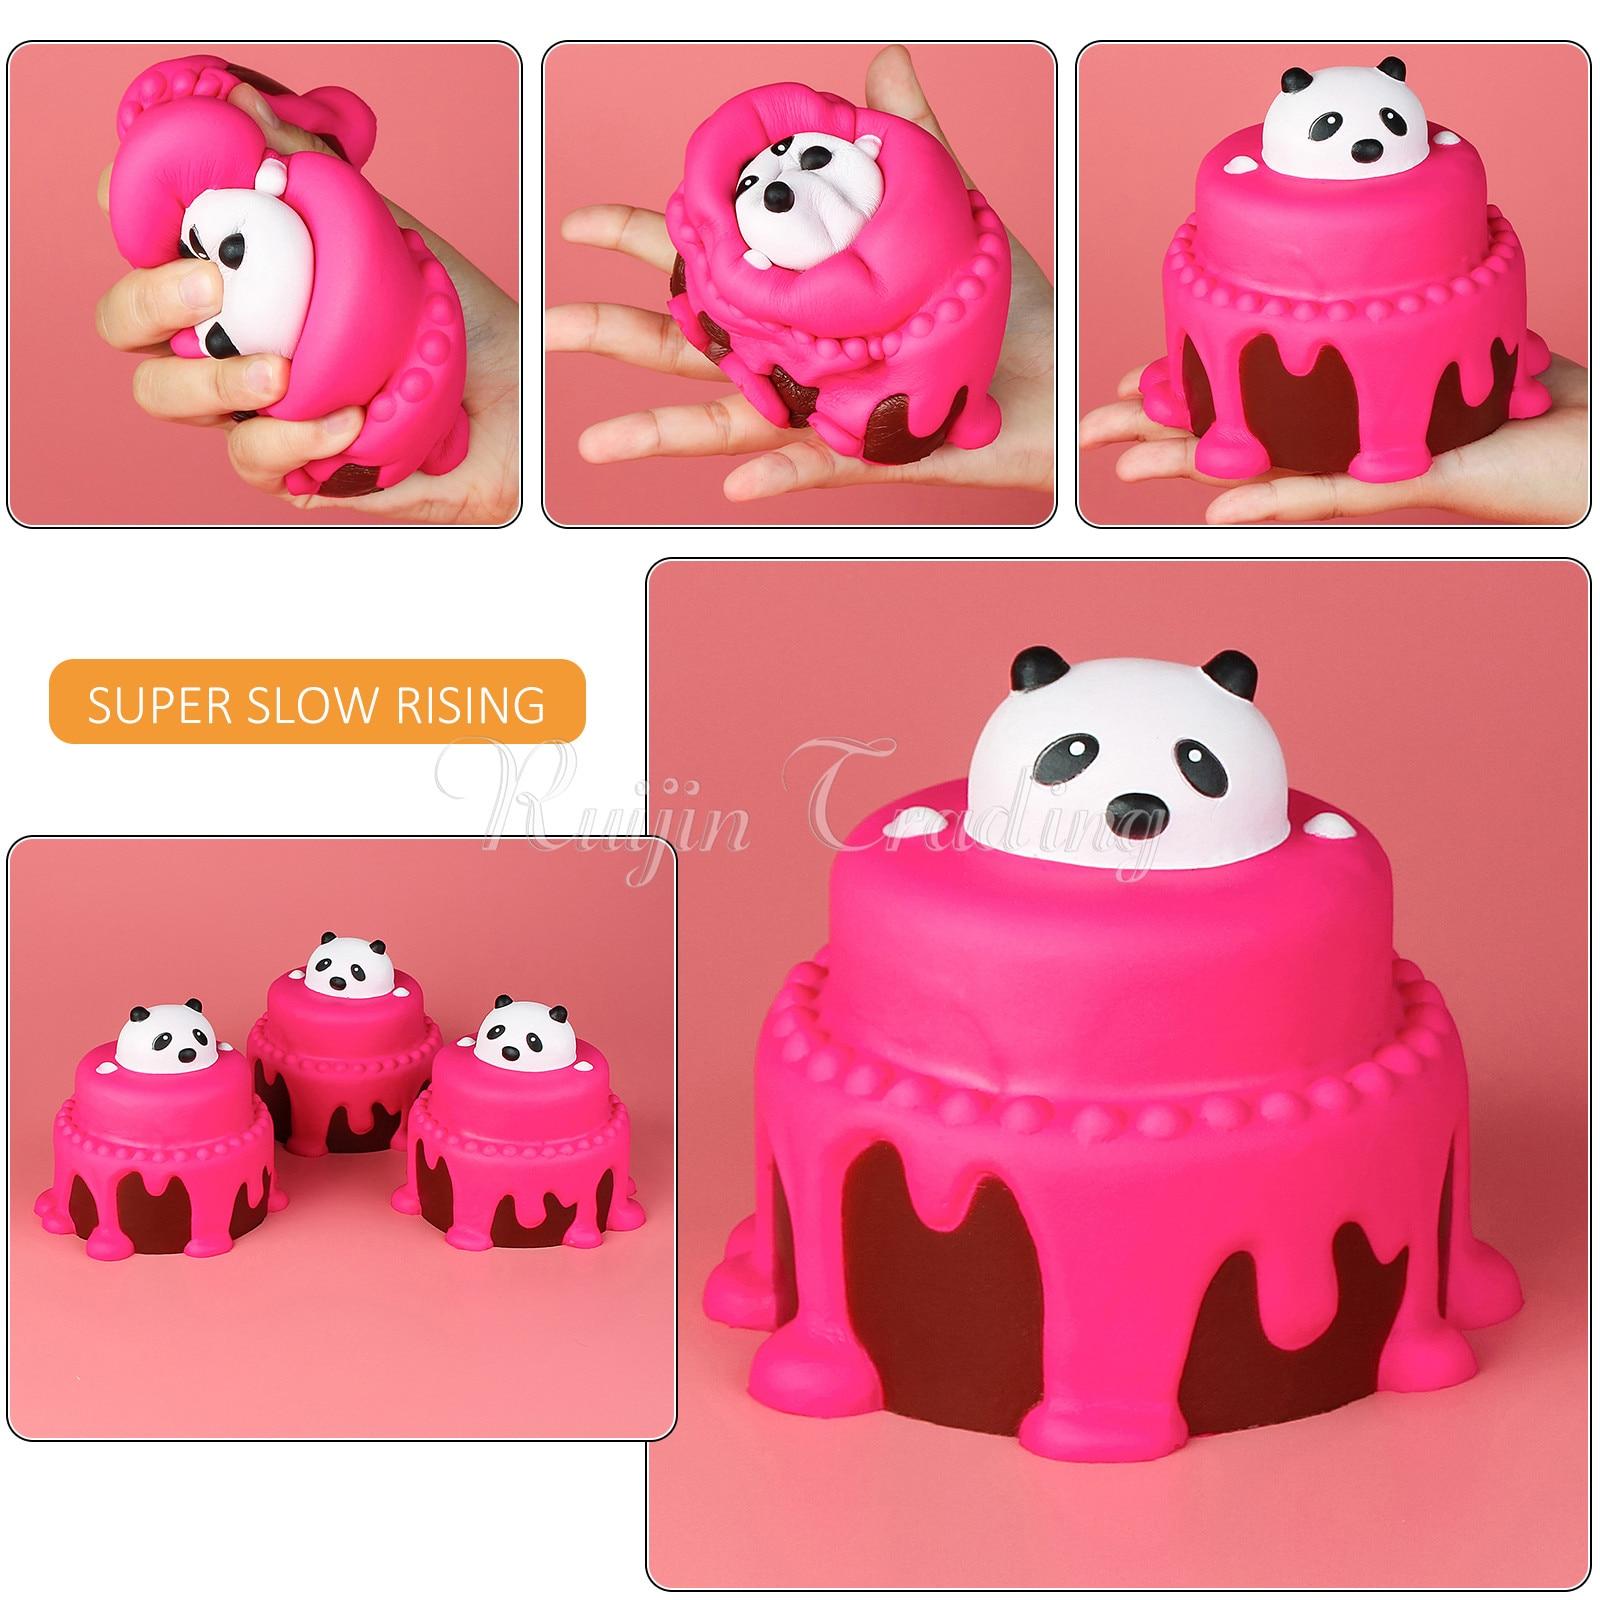 Squishy Toys Big W : Slow Rising Squishy Jumbo Panda Cake Cute Phone Straps Reatil Packing Cream Scented Birthday ...